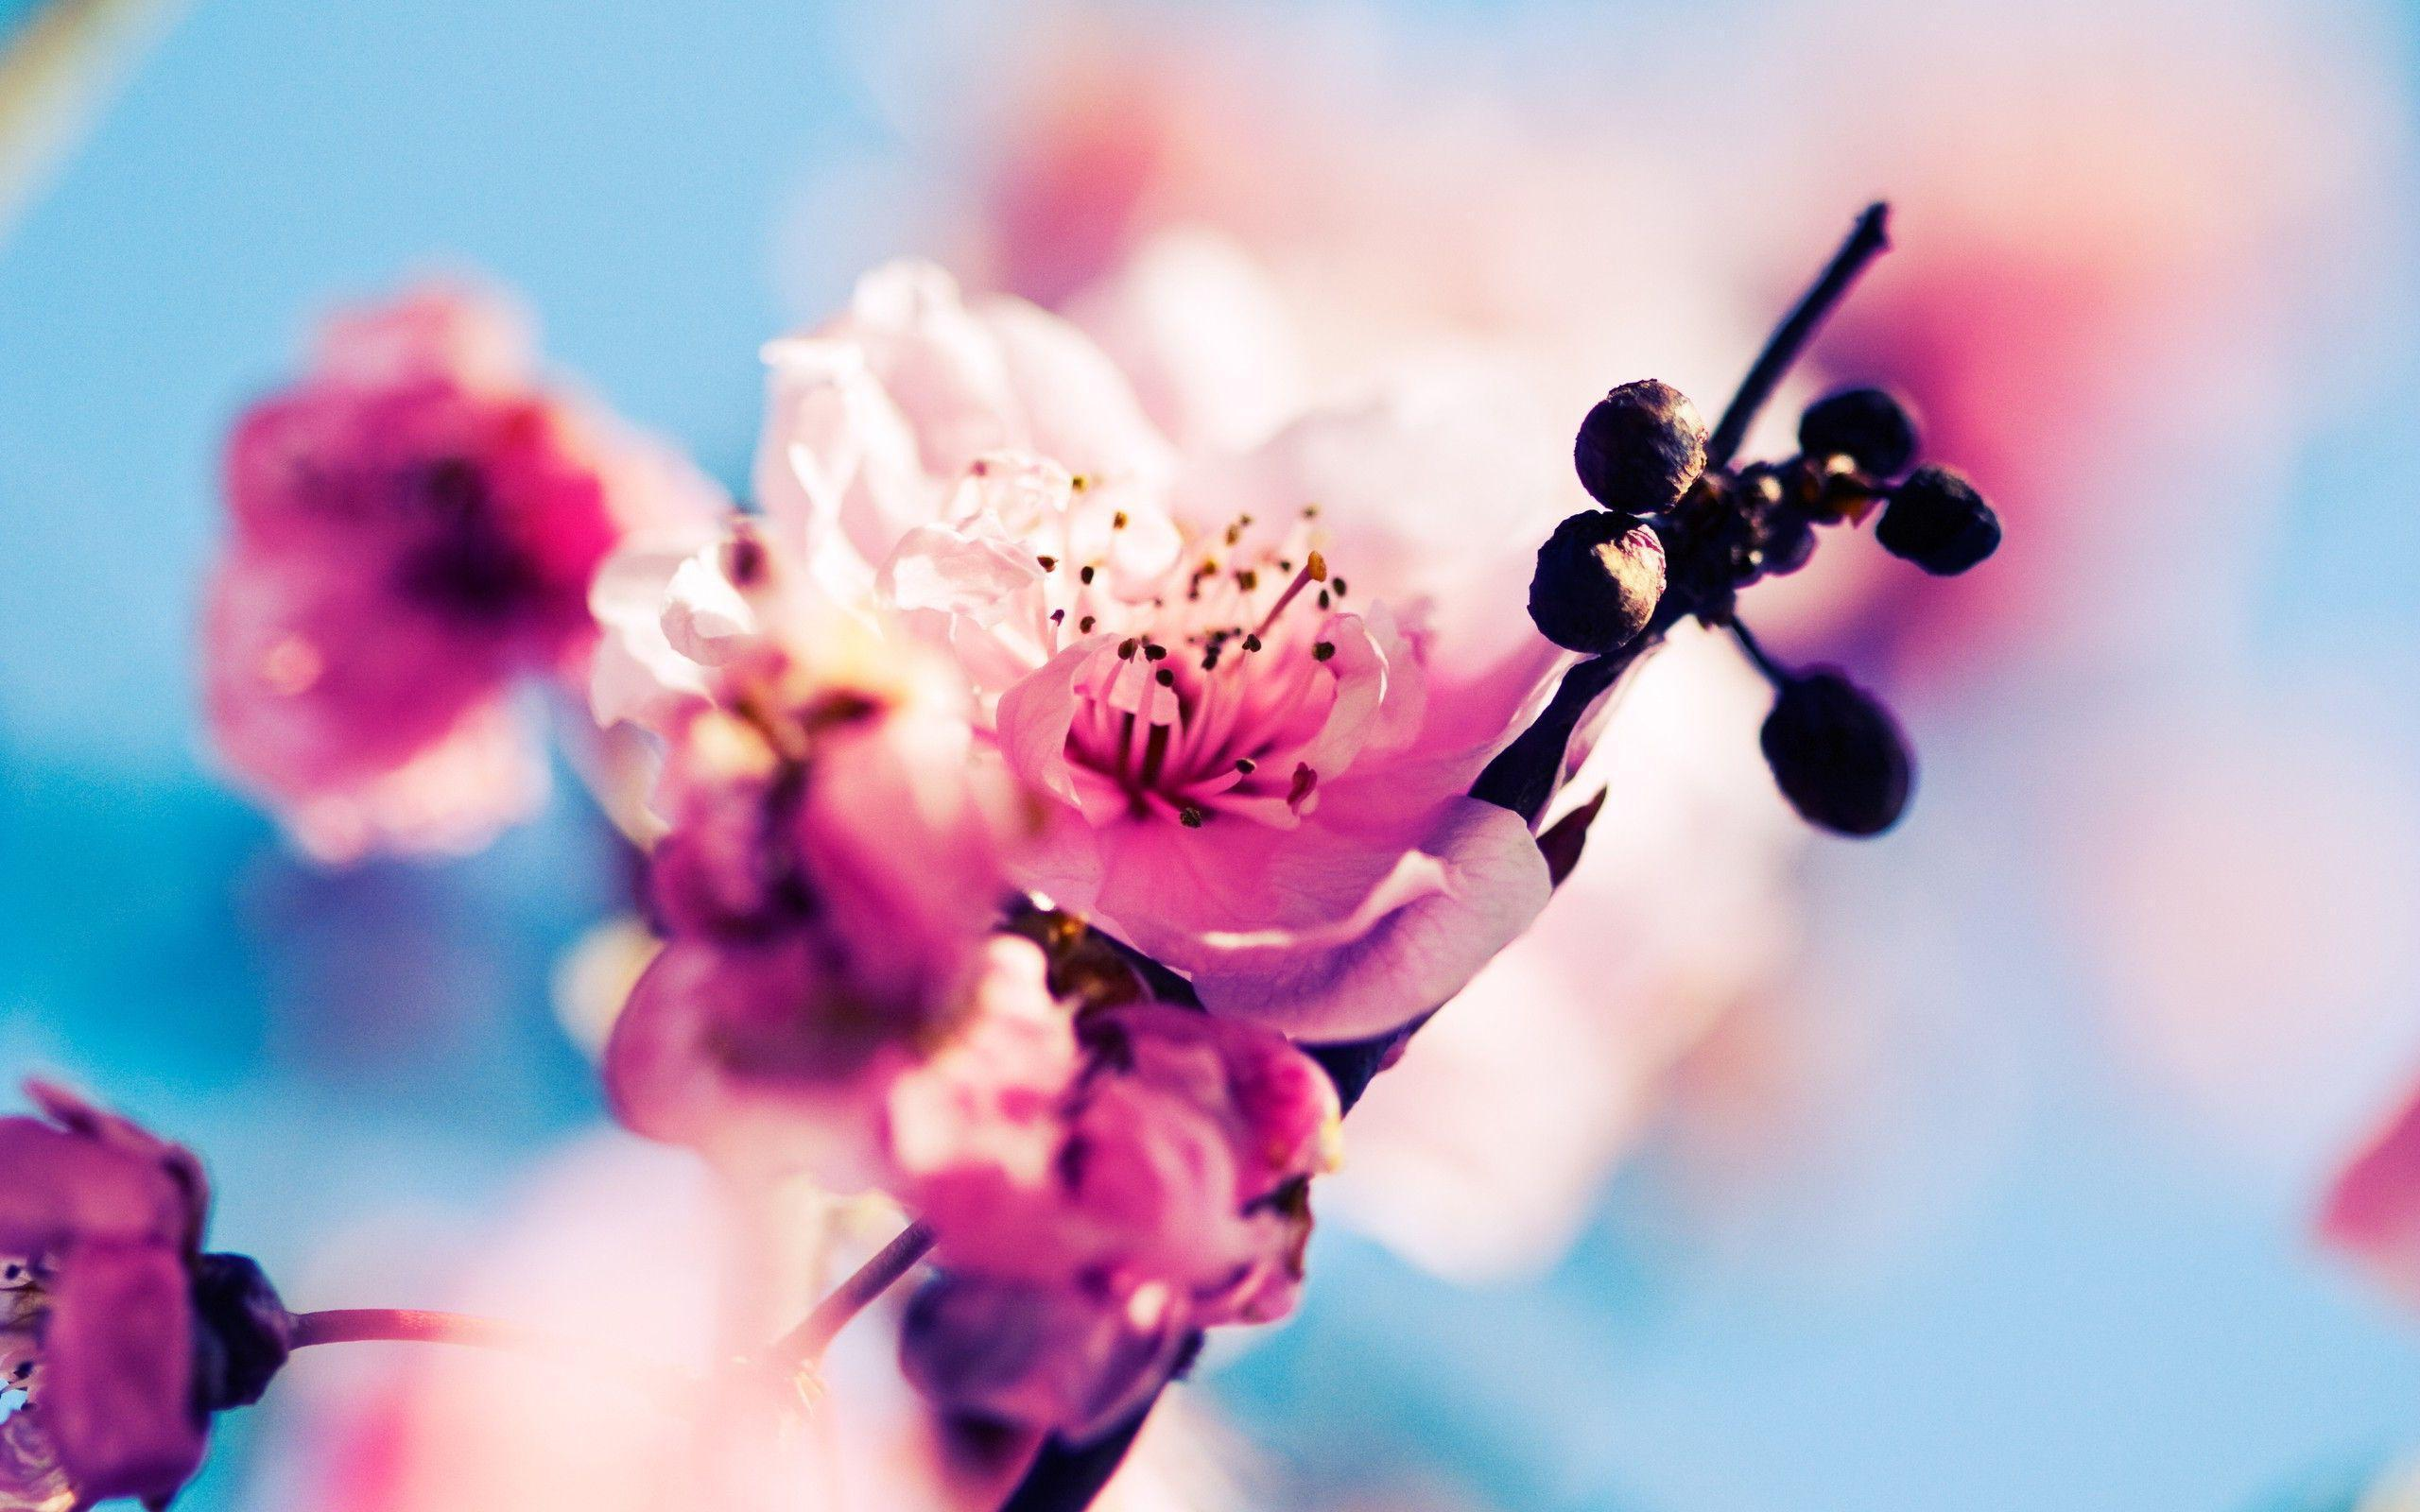 spring wallpaper | spring wallpaper - Part 4